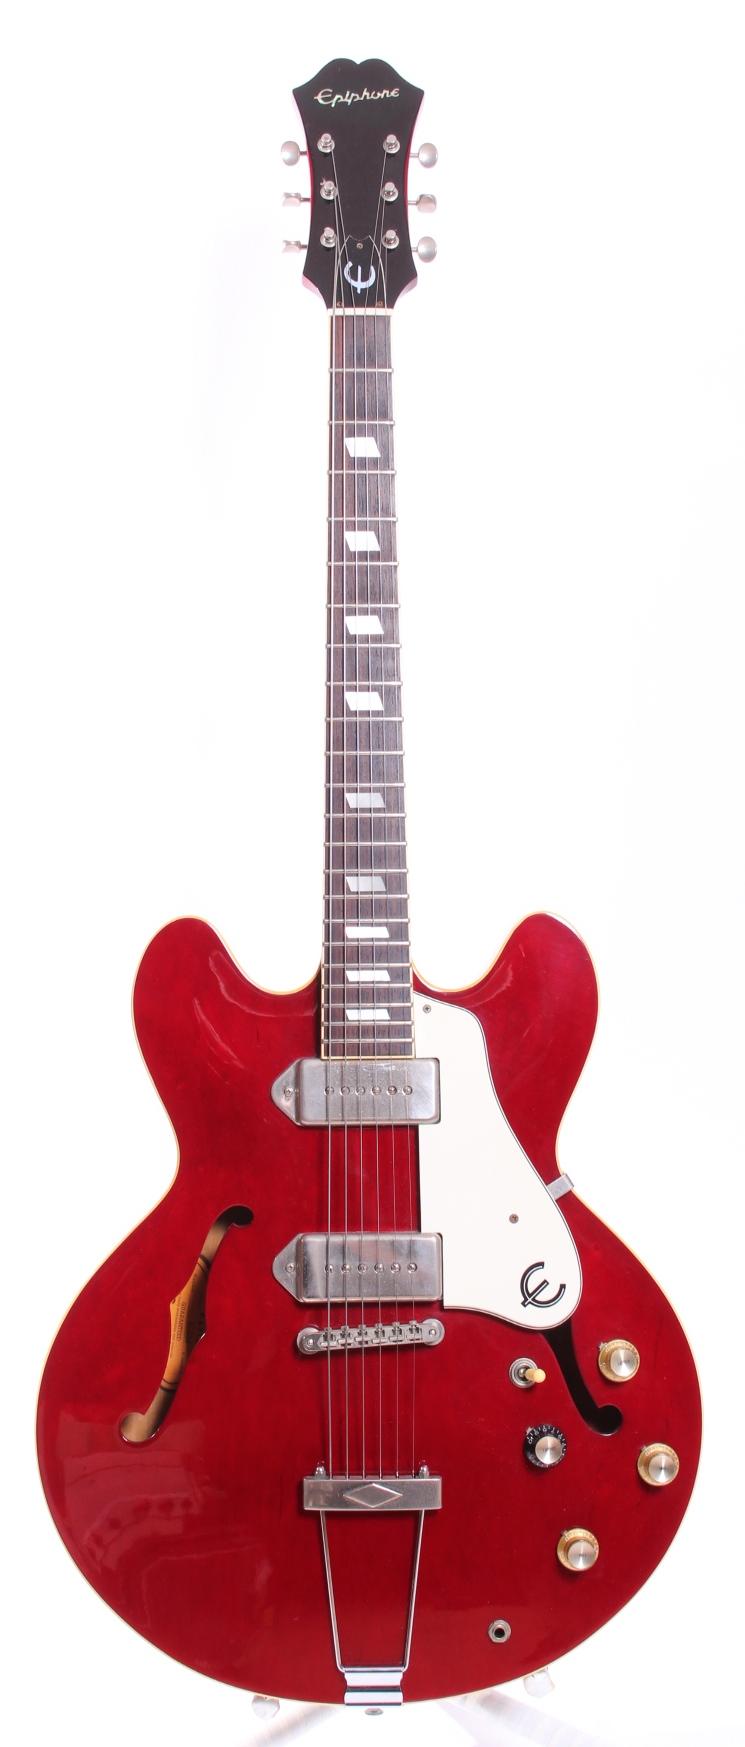 epiphone japan casino 1990 guitar for sale yeahman 39 s guitars. Black Bedroom Furniture Sets. Home Design Ideas